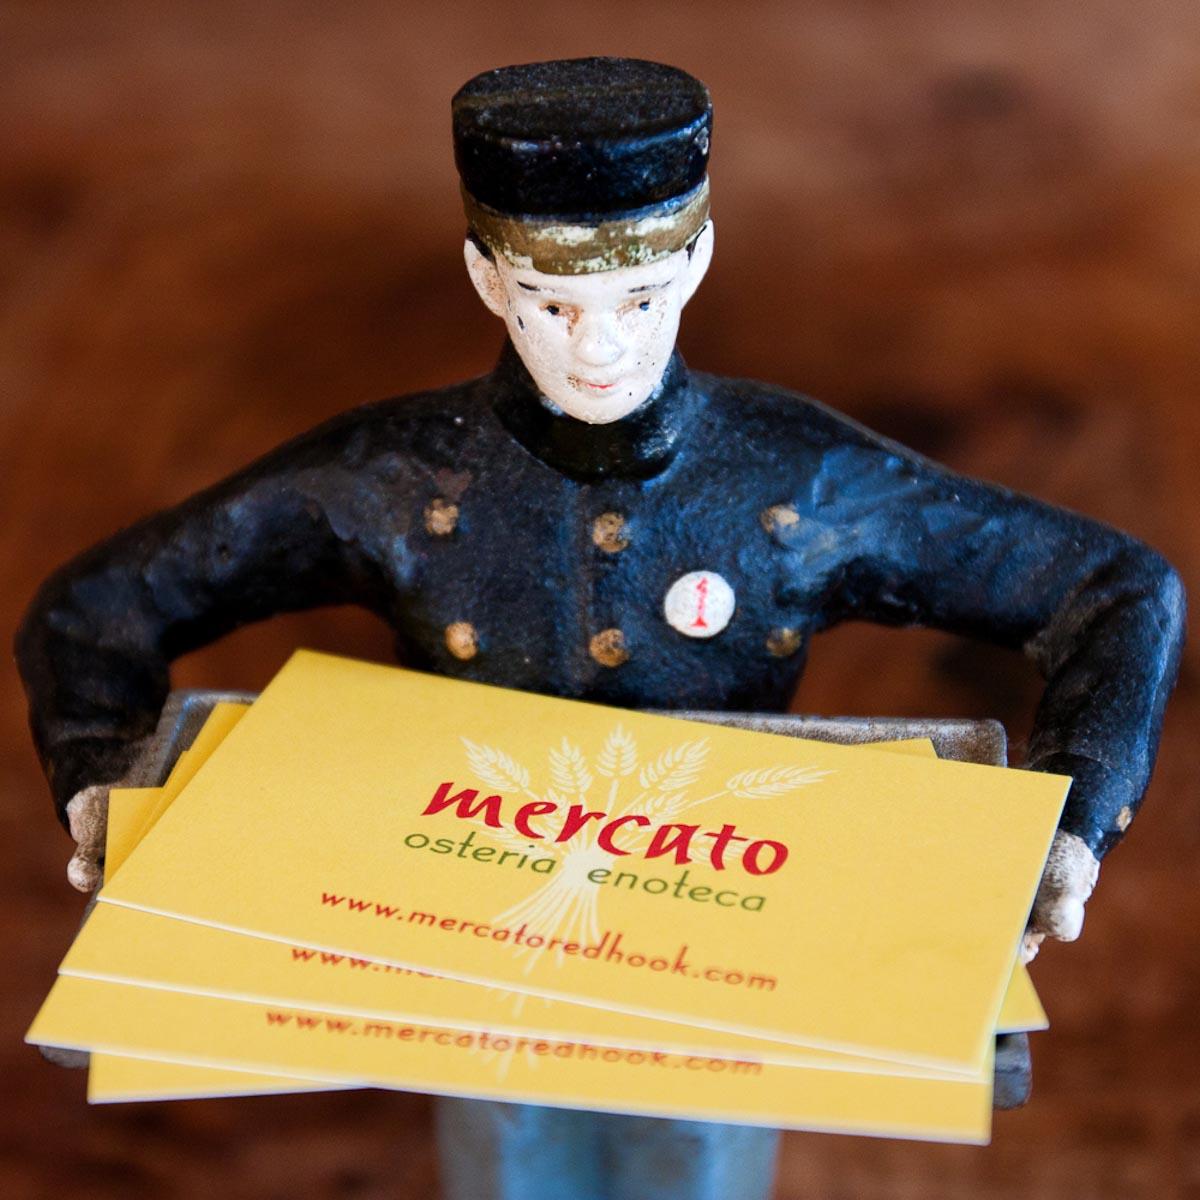 Photograph courtesy of Mercato